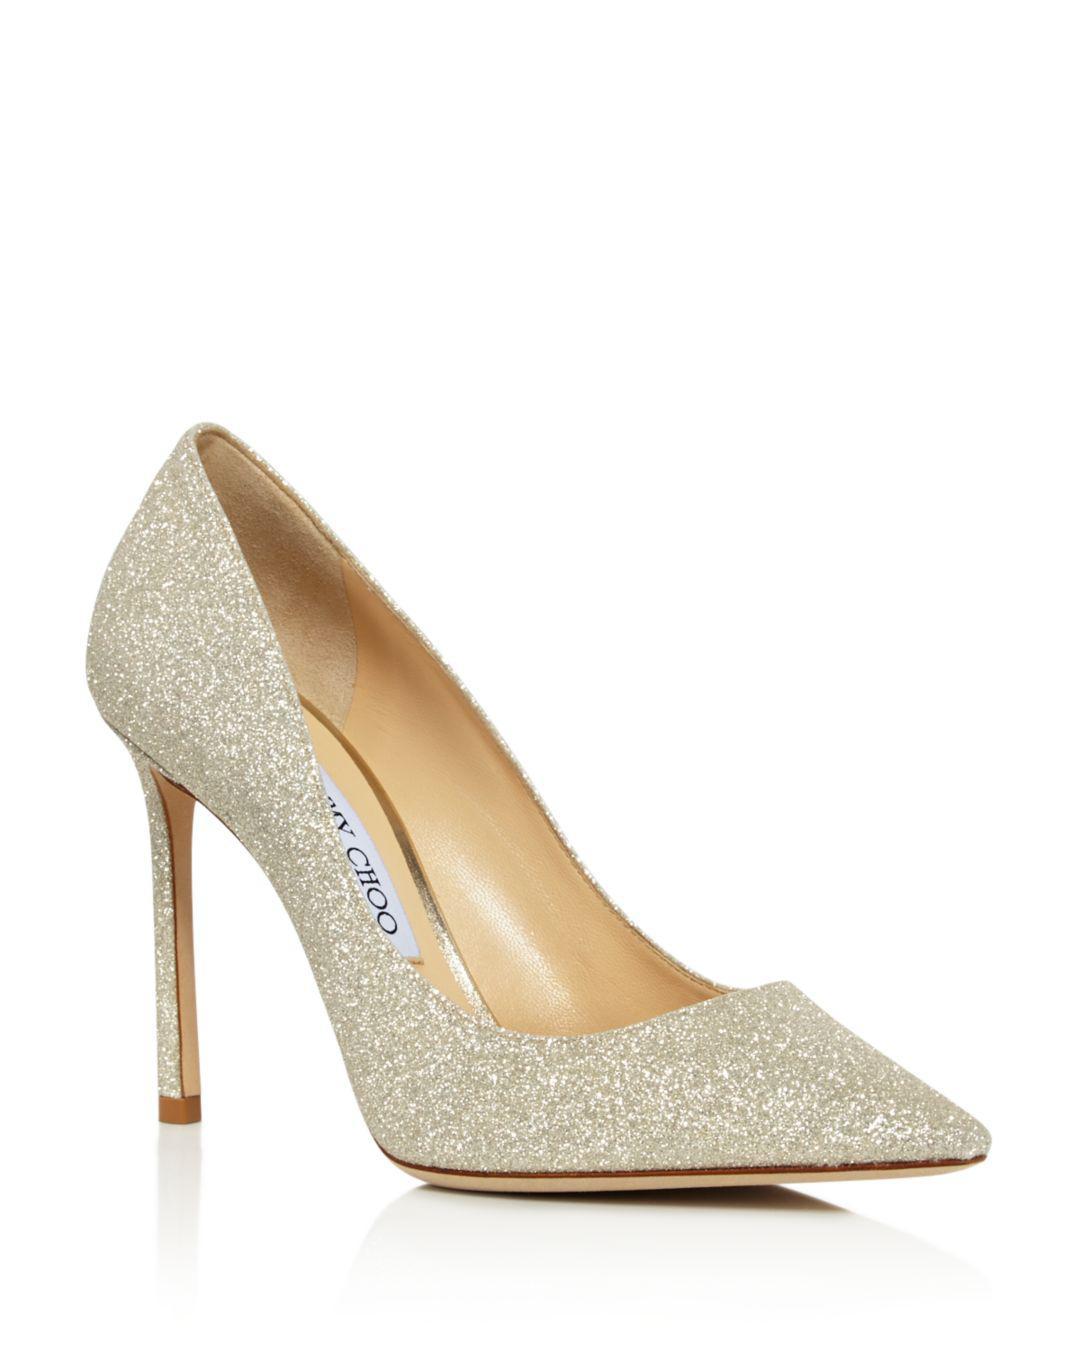 a0b43c9b2398 Lyst - Jimmy Choo Women s Romy 100 Glitter Leather High-heel Pumps ...